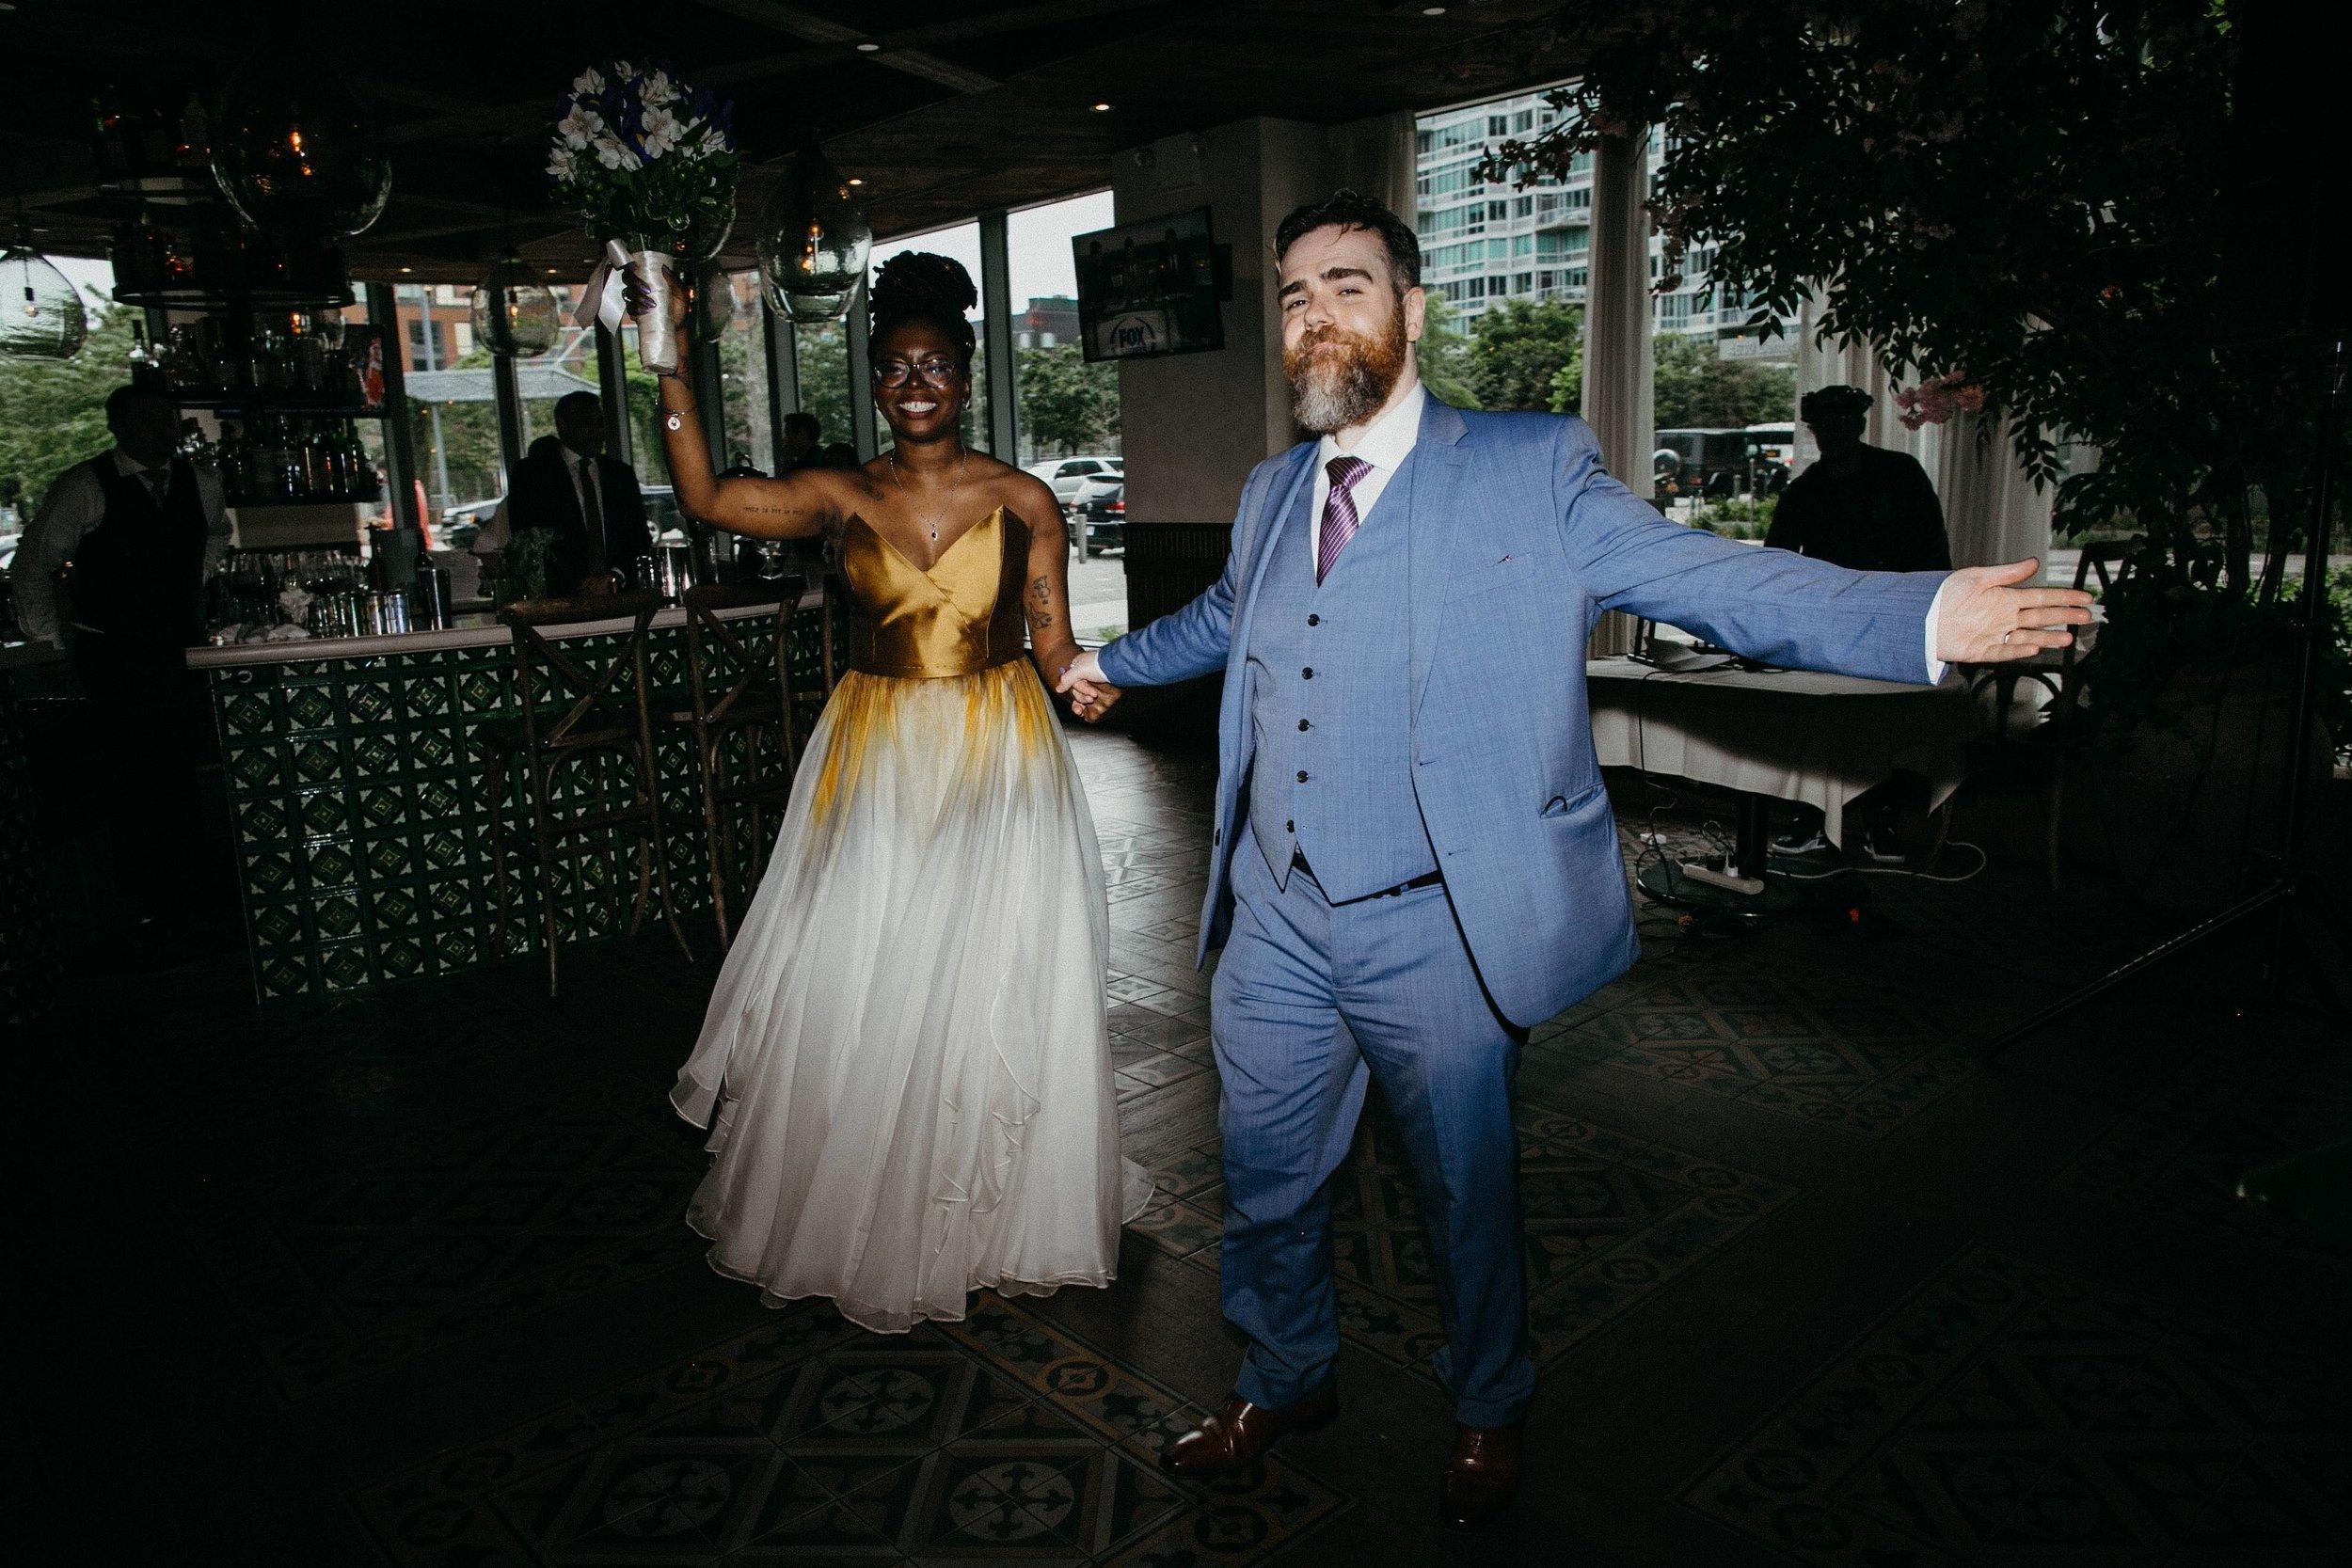 Sevlynn-Photography-Wedding-LIC-Landing-Maiella-NYC-61.jpg